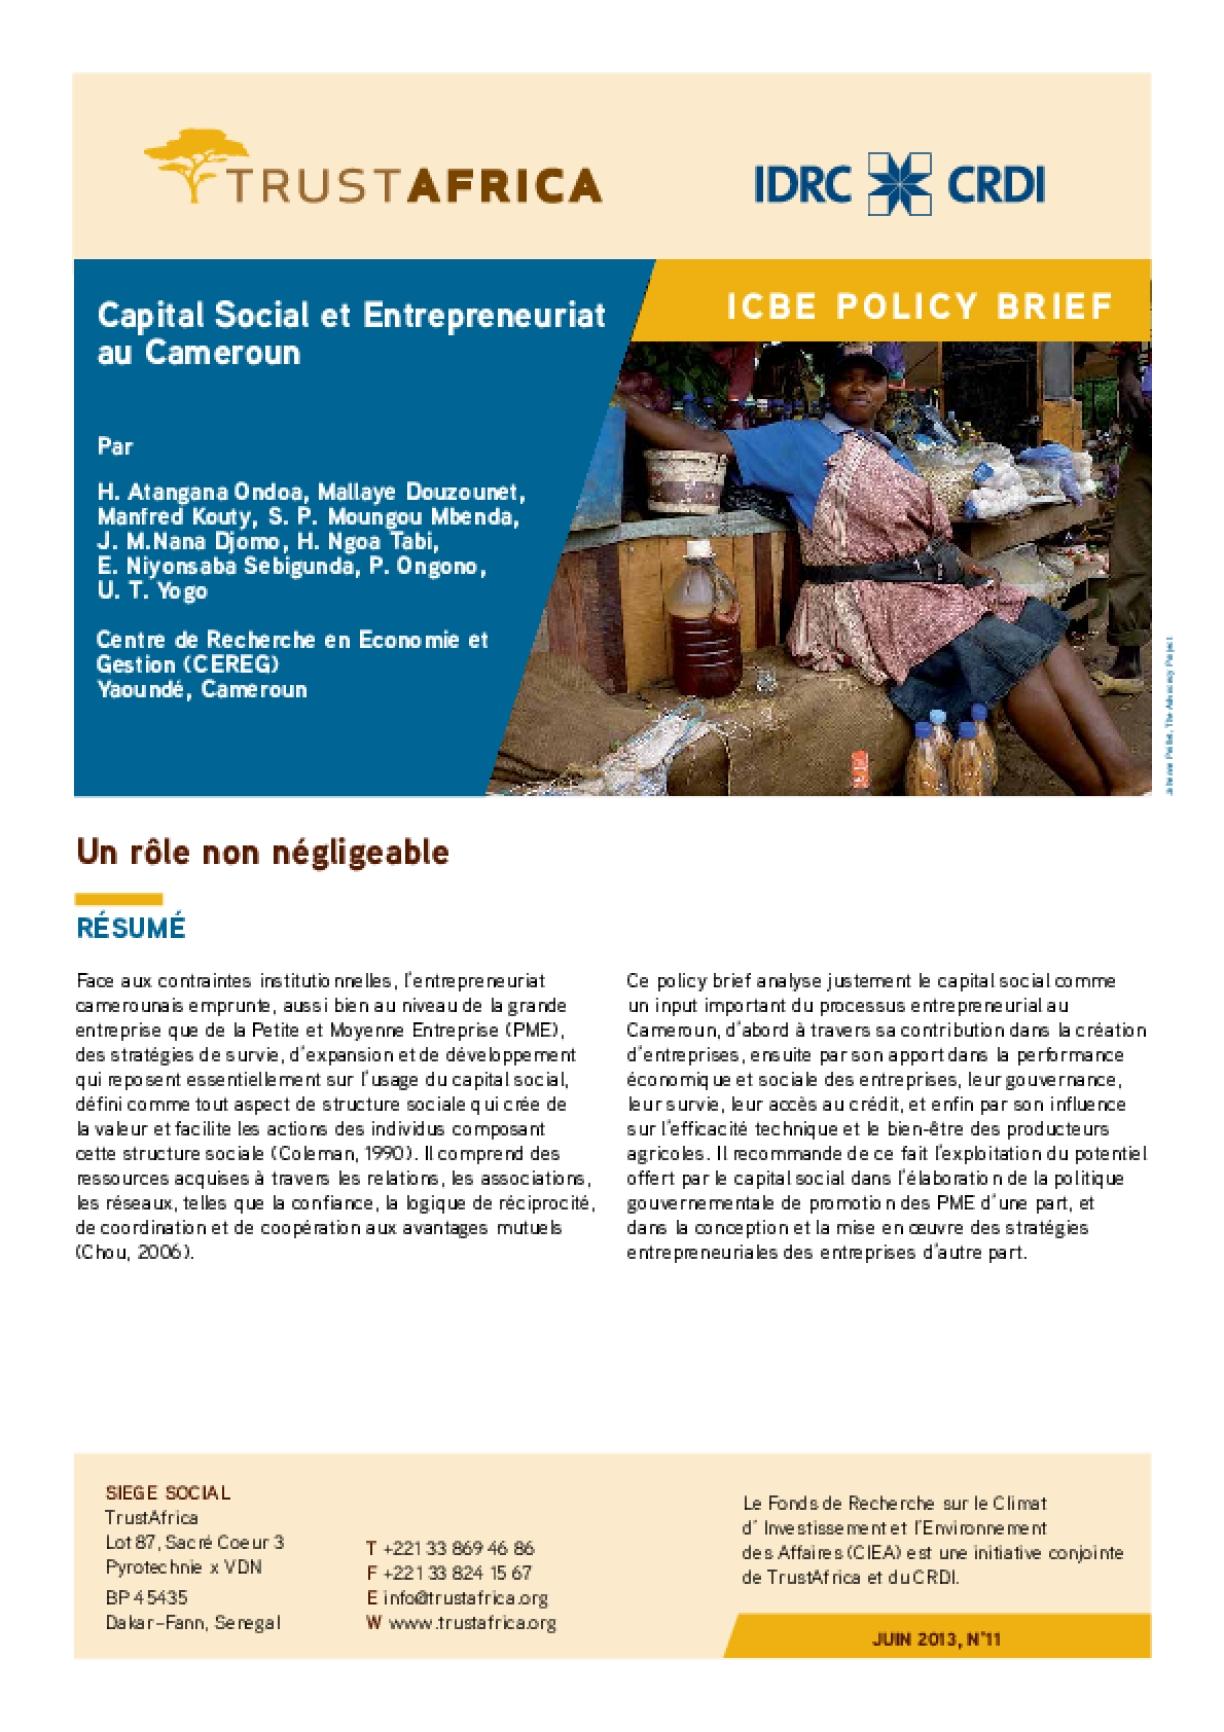 Capital Social et Entrepreneuriat au Cameroun